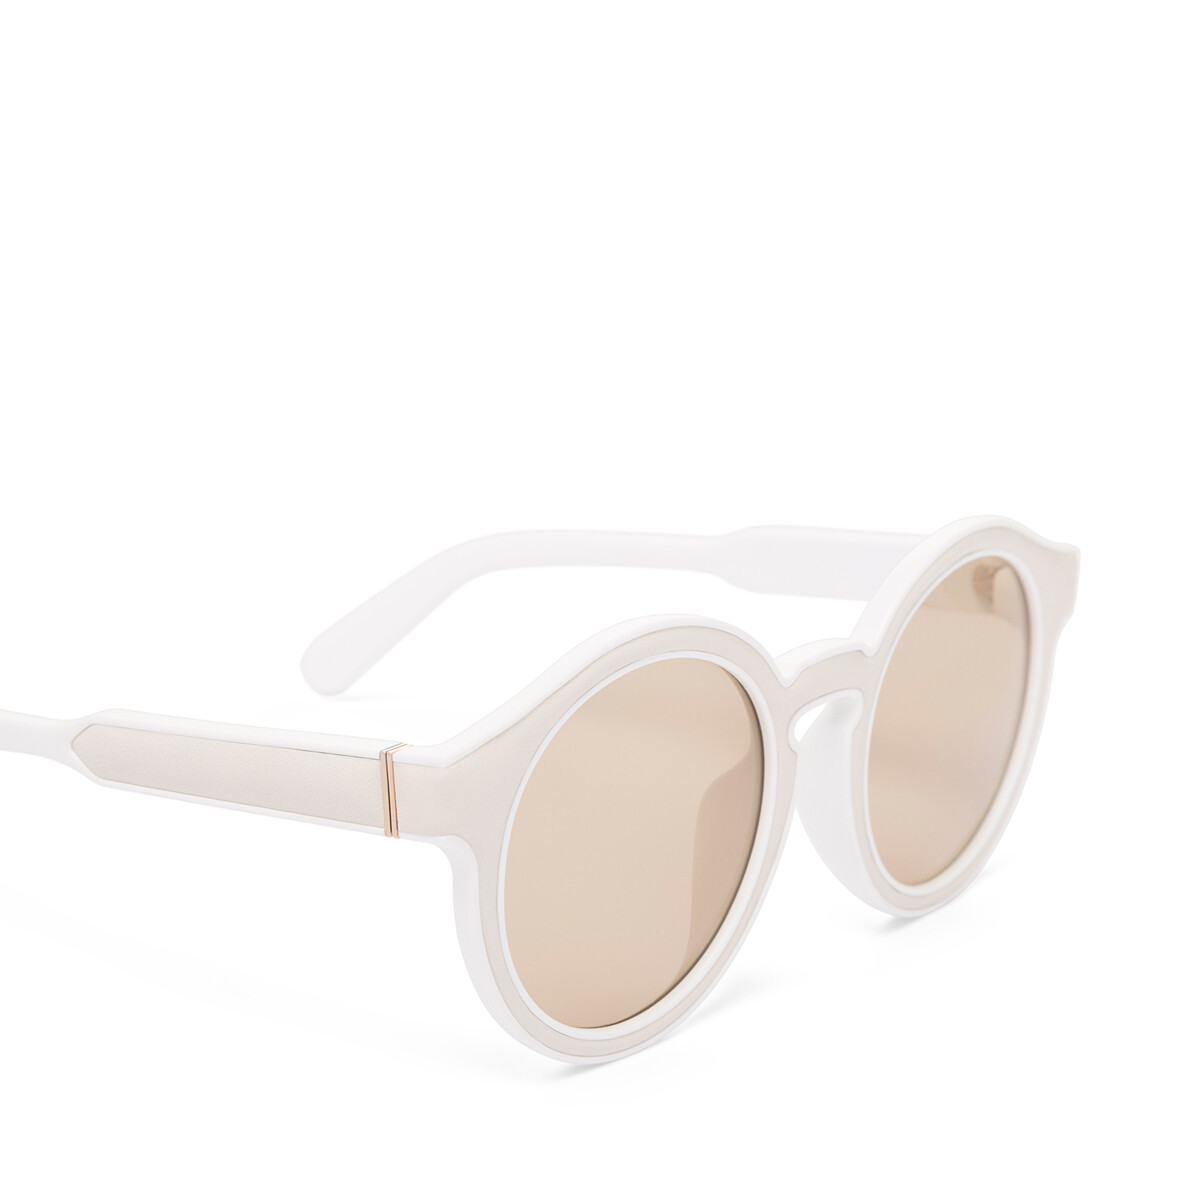 LOEWE Round Padded Sunglasses White/Light Brown front